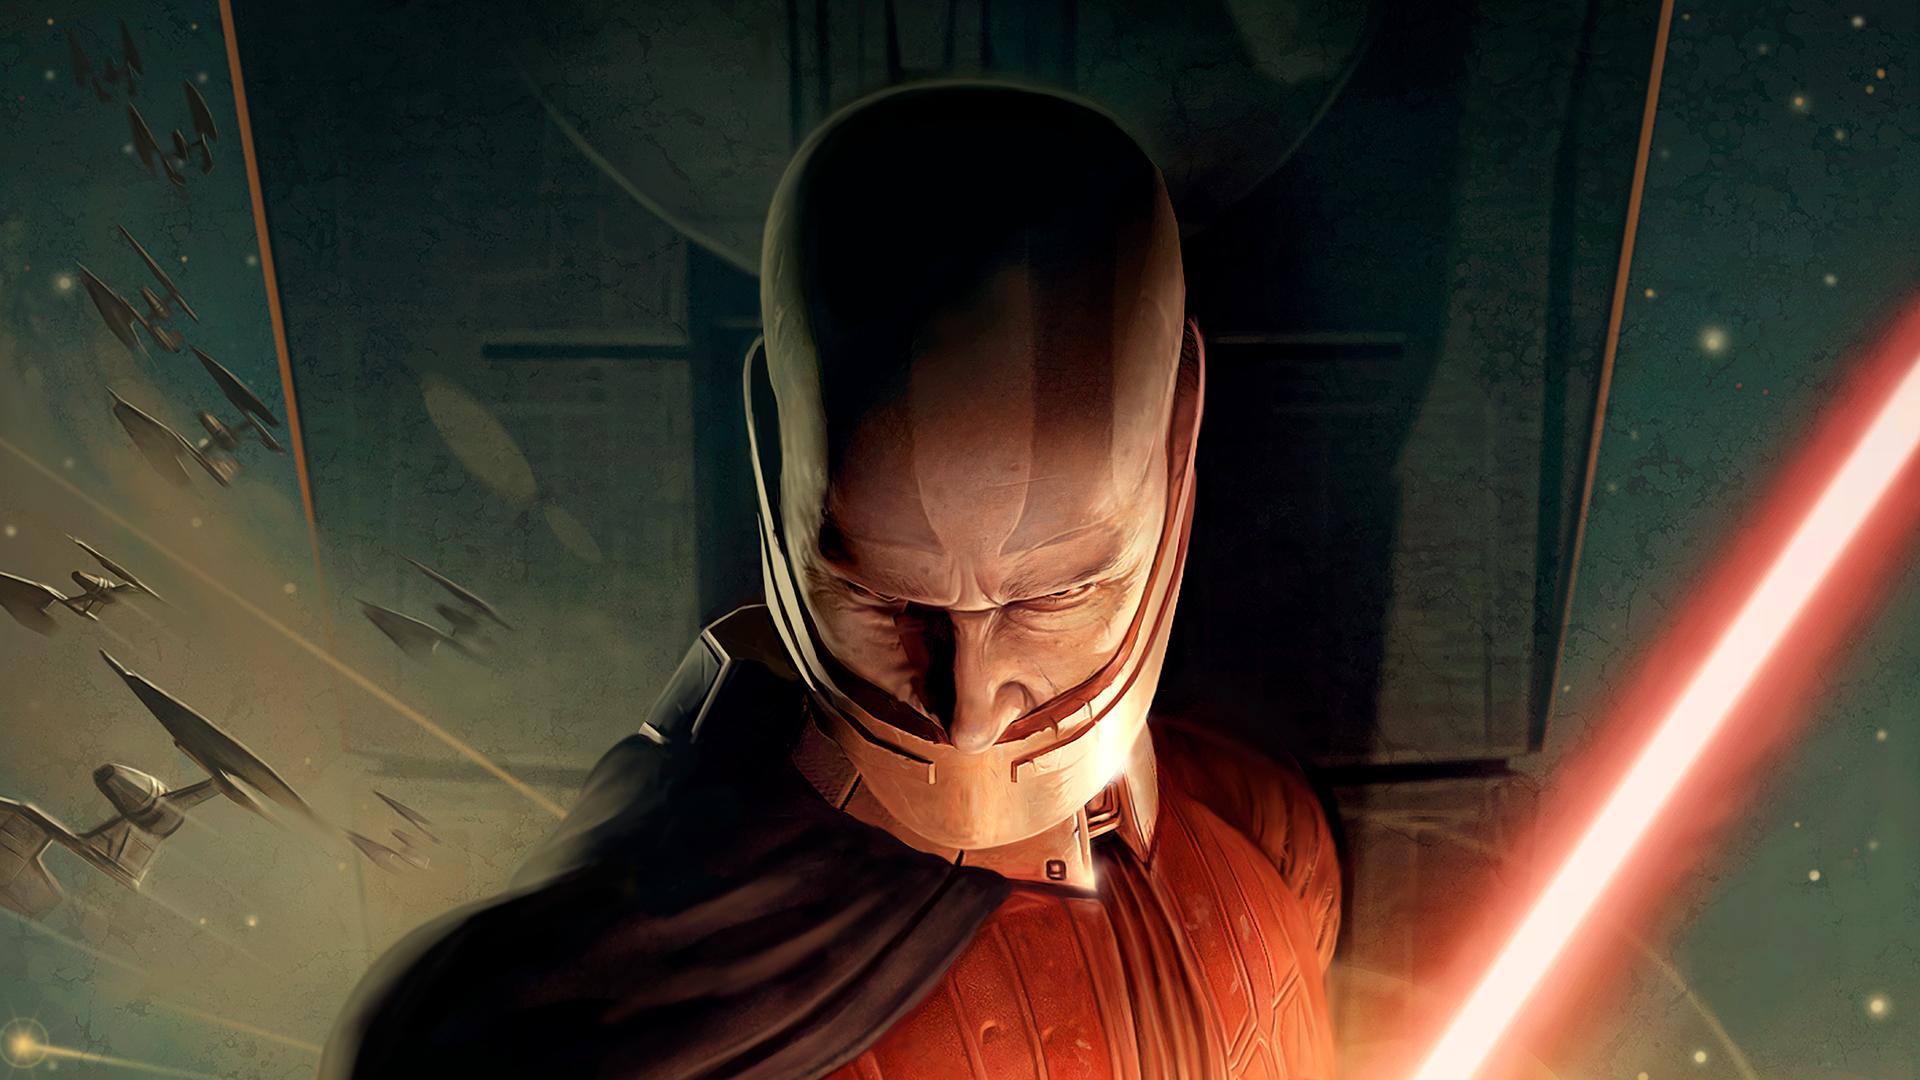 Star Wars: Knights of the Old Republic - Darth Malak artwork